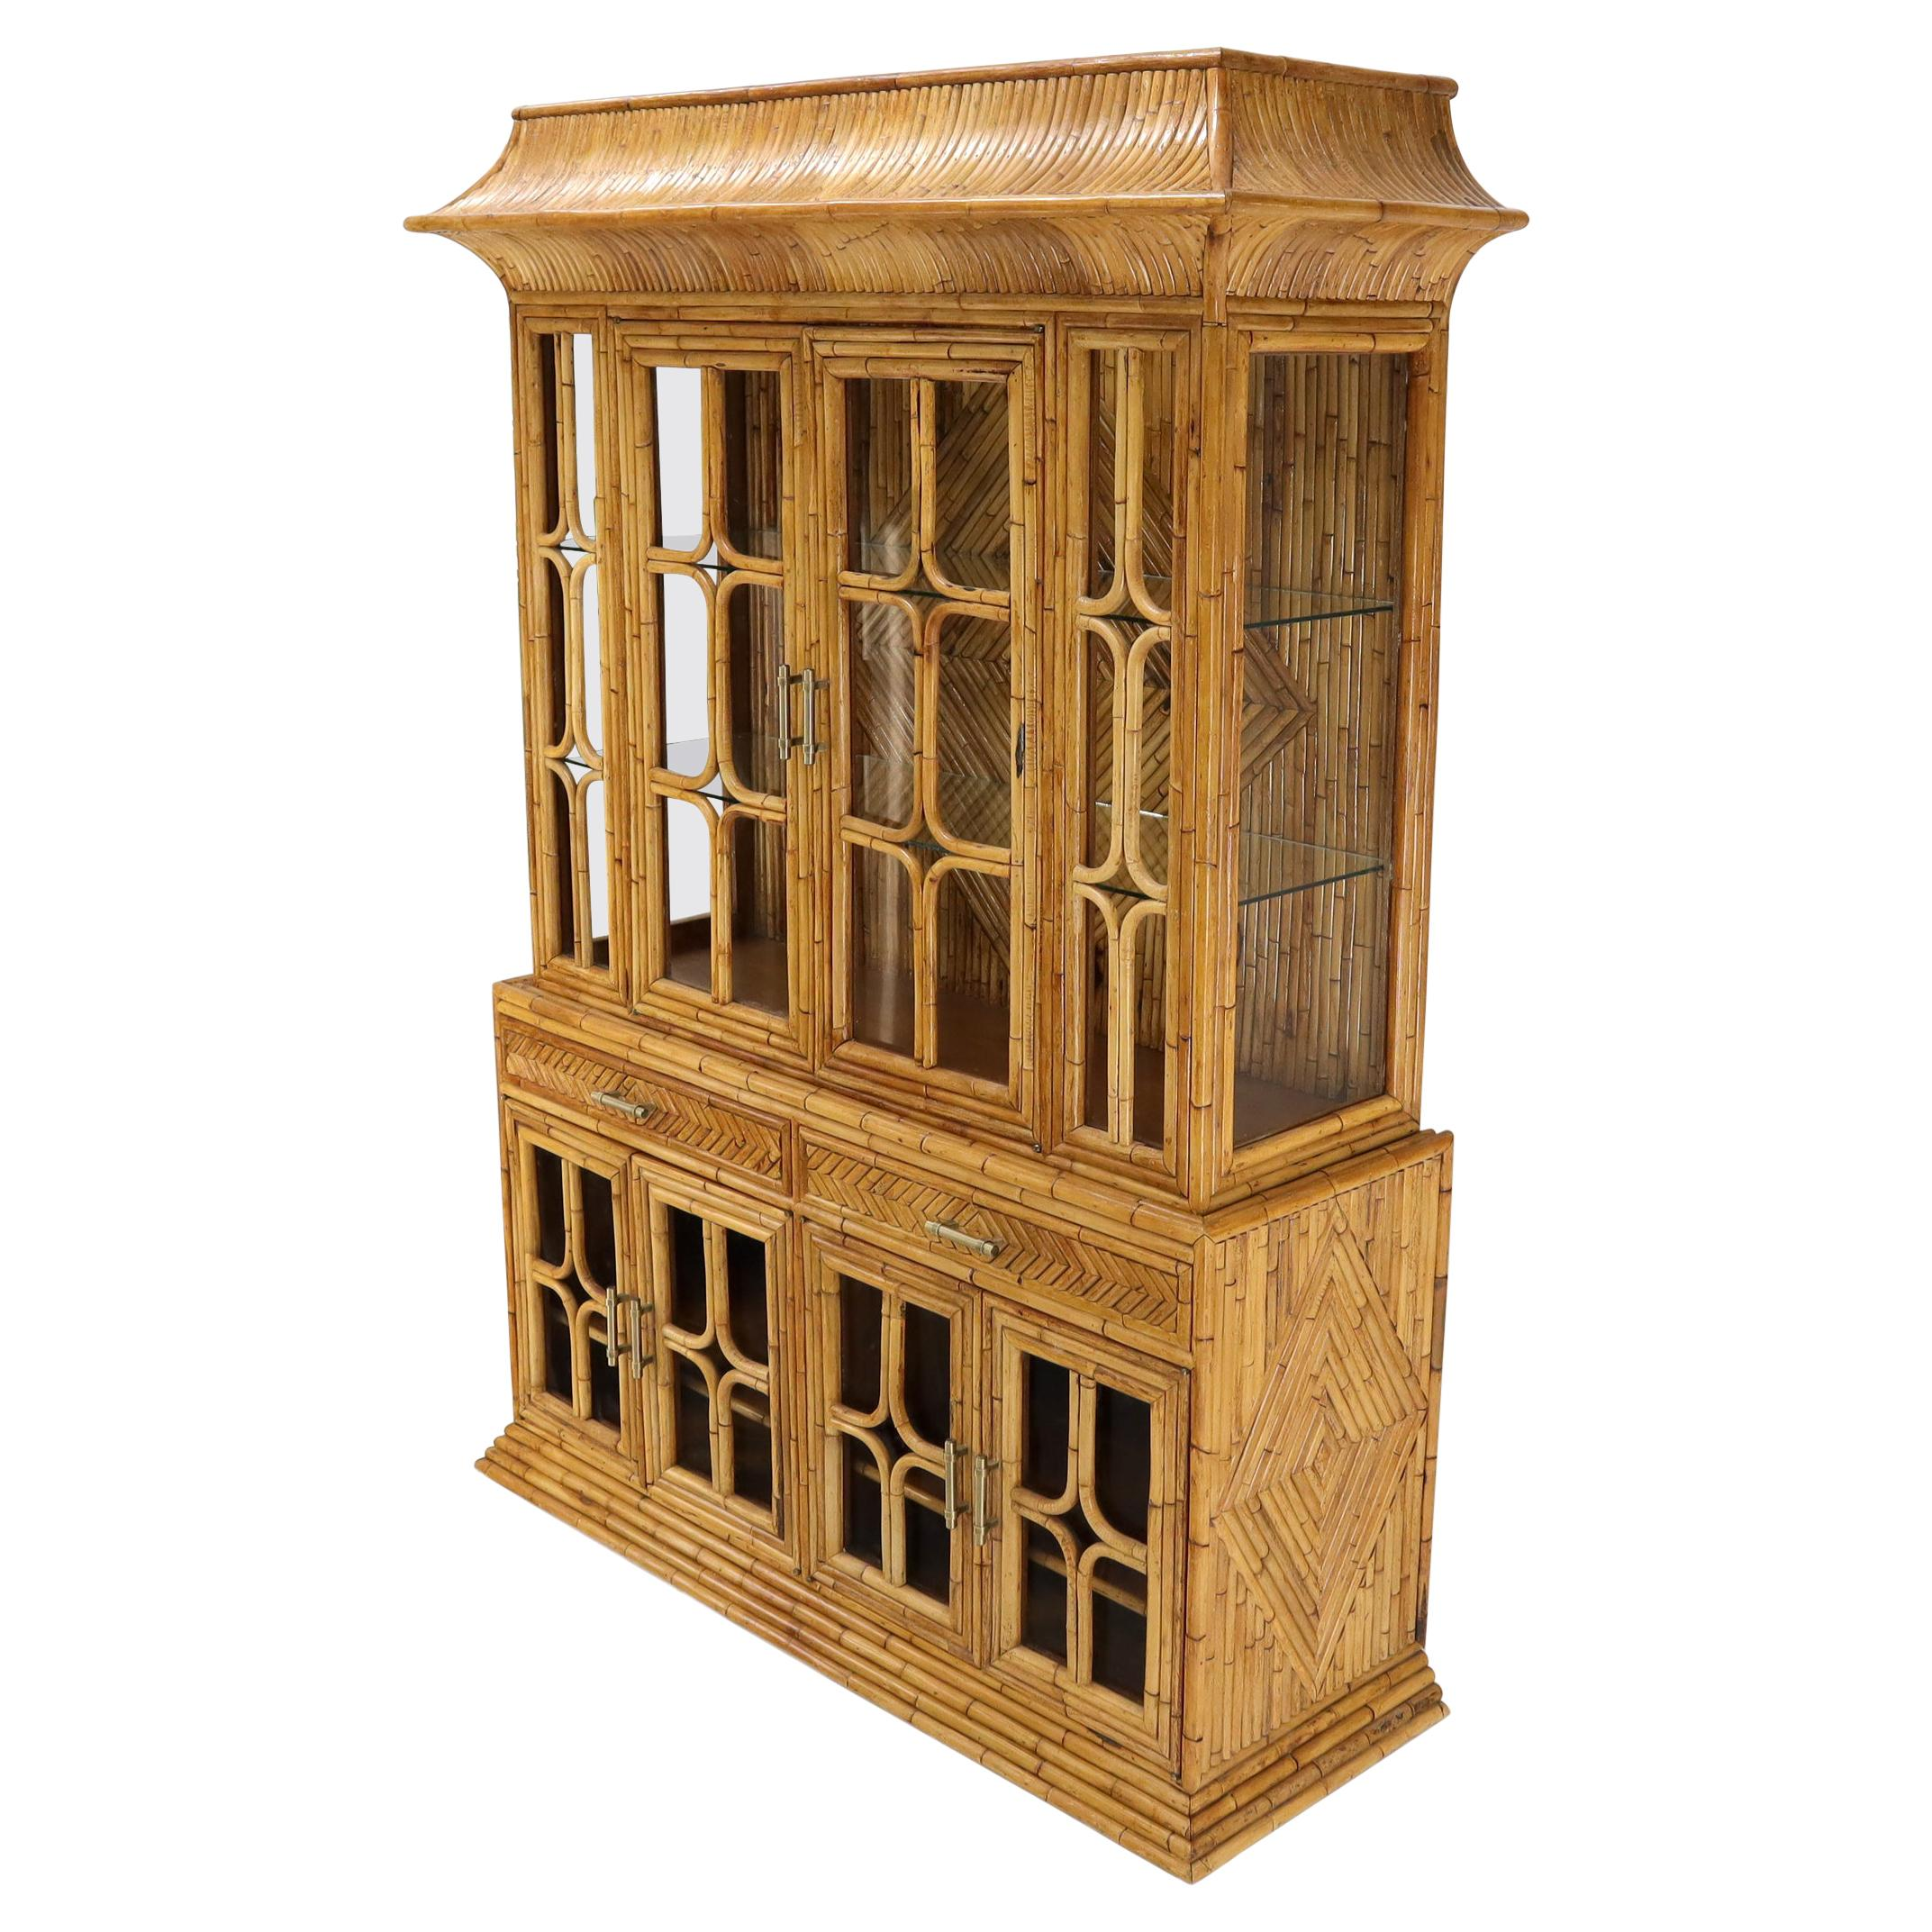 Oriental Asian Style Bamboo Rattan Hutch Buffet Display Cabinet Curio Sideboard